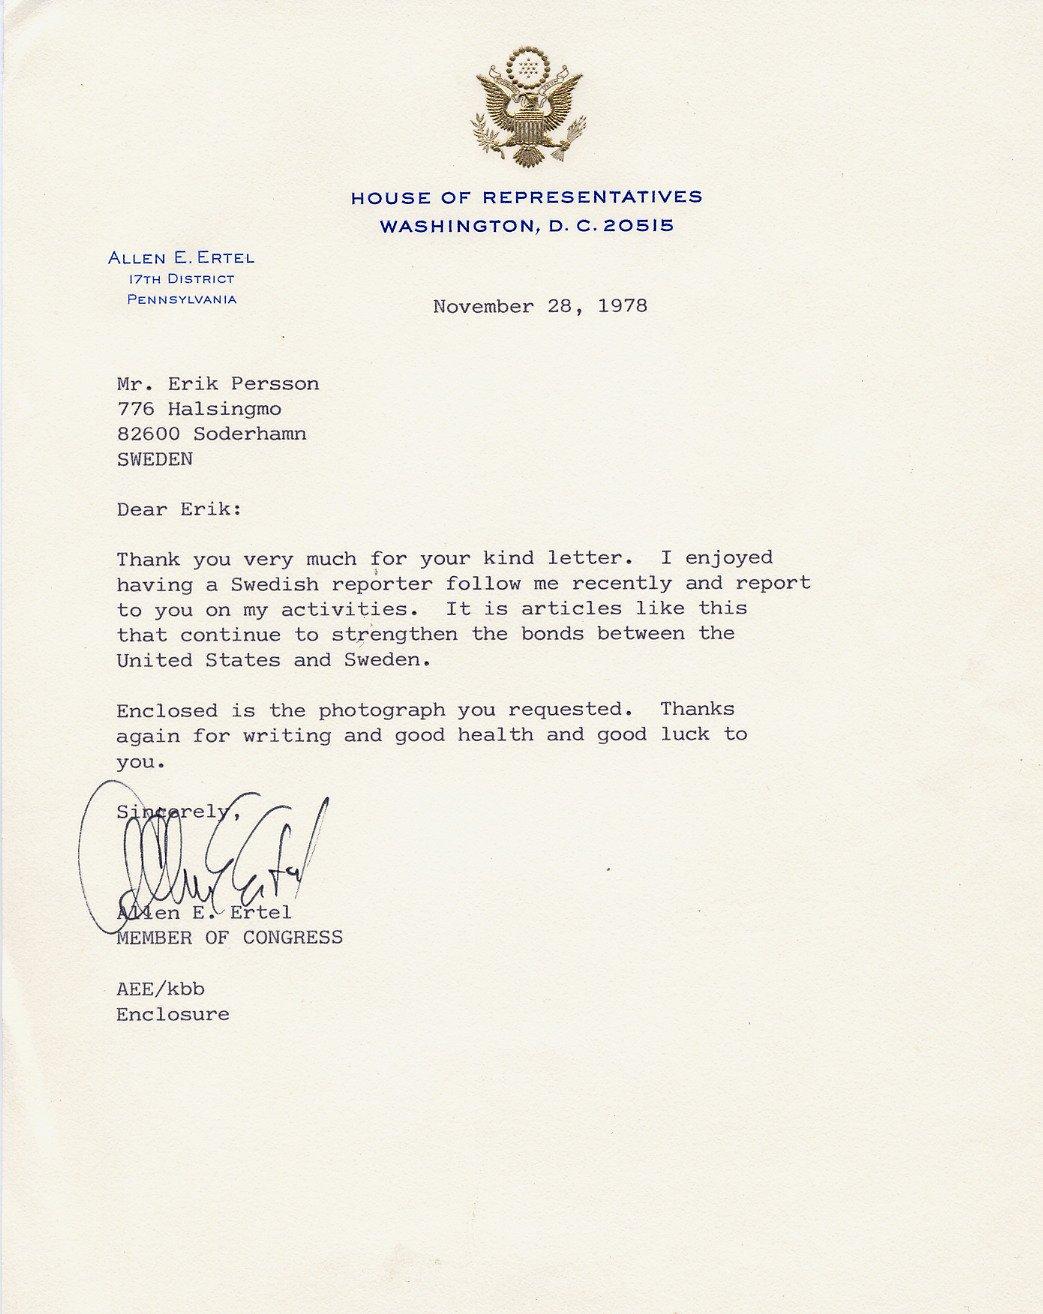 1977-83 US Representative from PA ALLEN E. ERTEL Typed Letter Signed 1978